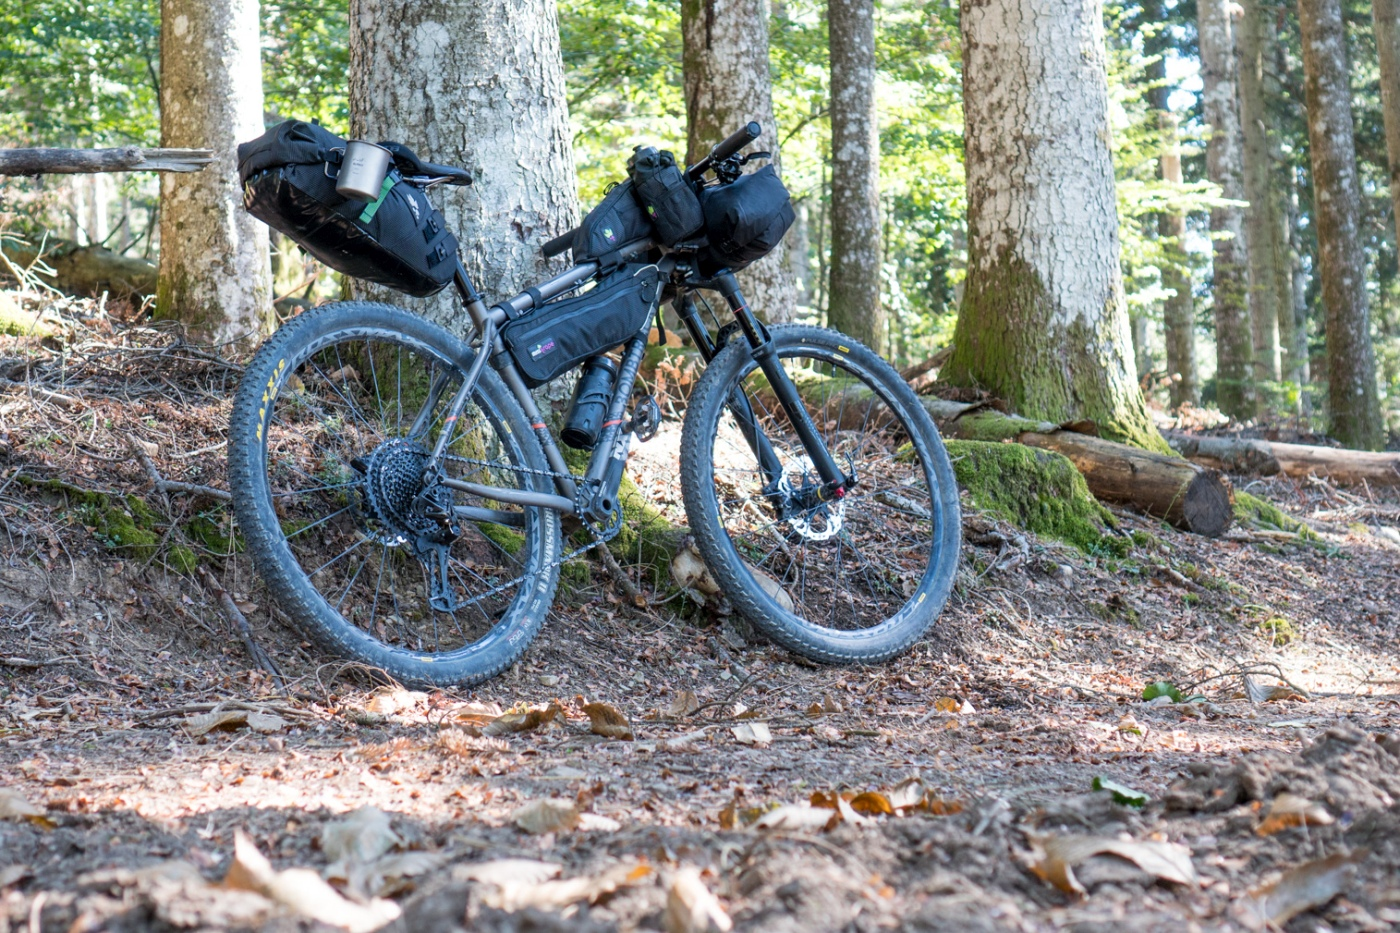 pratomagno_bikepacking-10